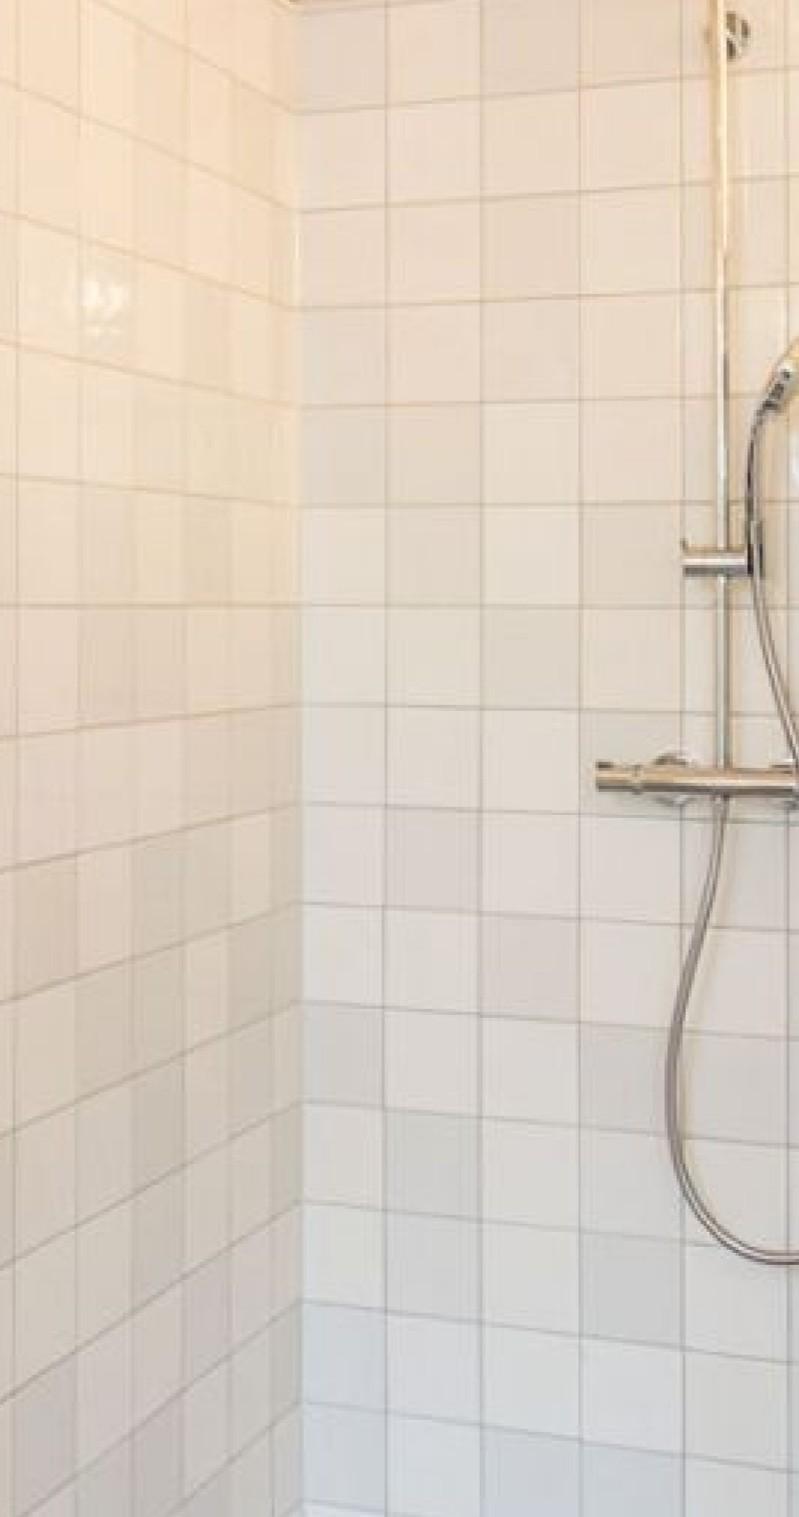 Friese witje steenbok grijsmix 13x13 aanbieding op=op €20 per m2 *Gratis hoektegels* -6947